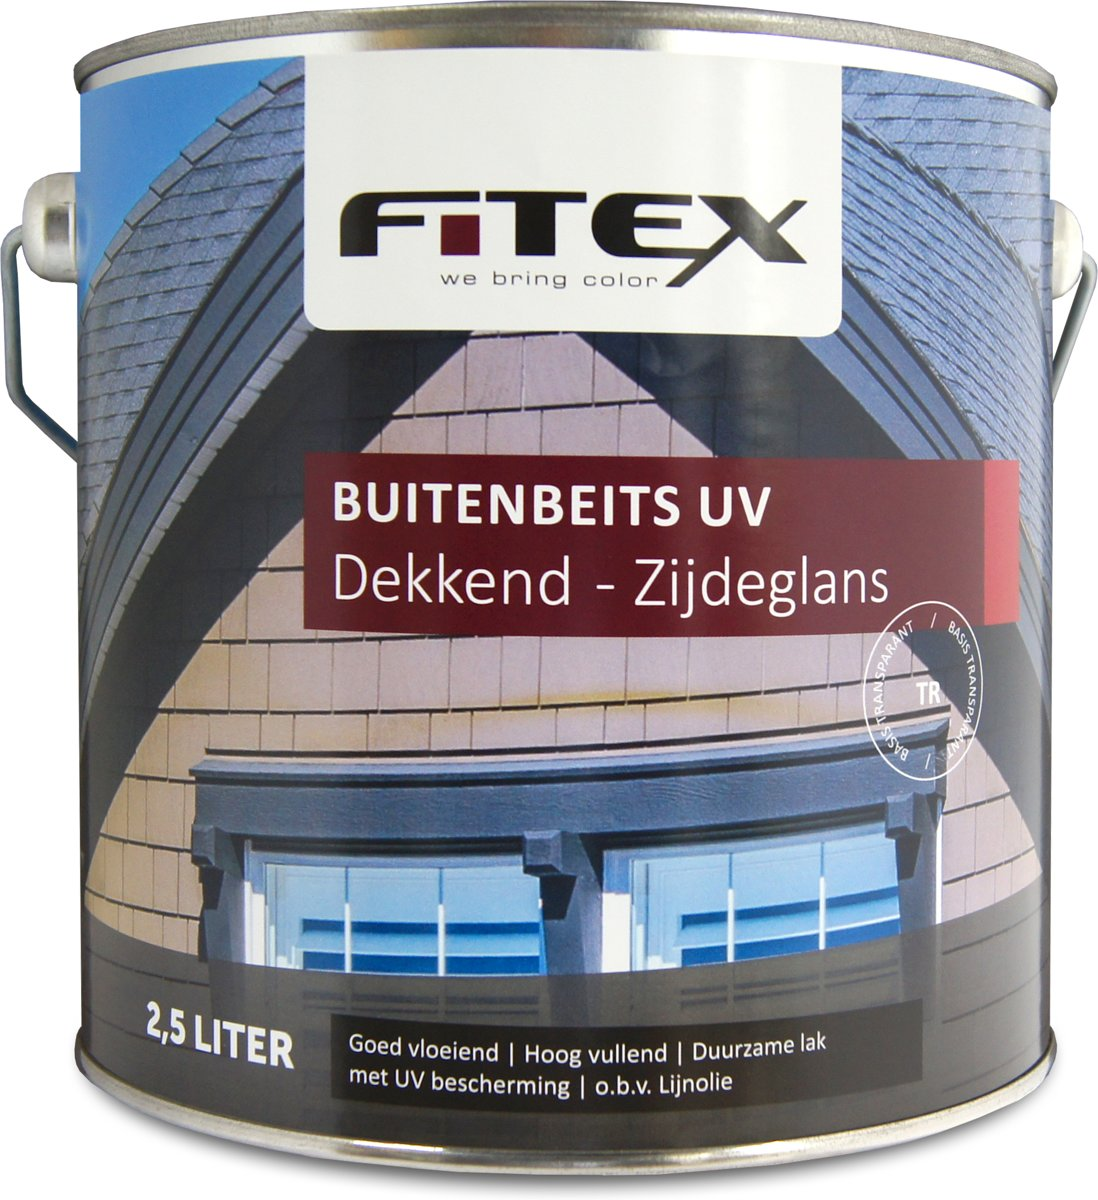 Fitex-Buitenbeits UV-Zijdeglans-Grachtengroen Q0.05.10-2,5 liter